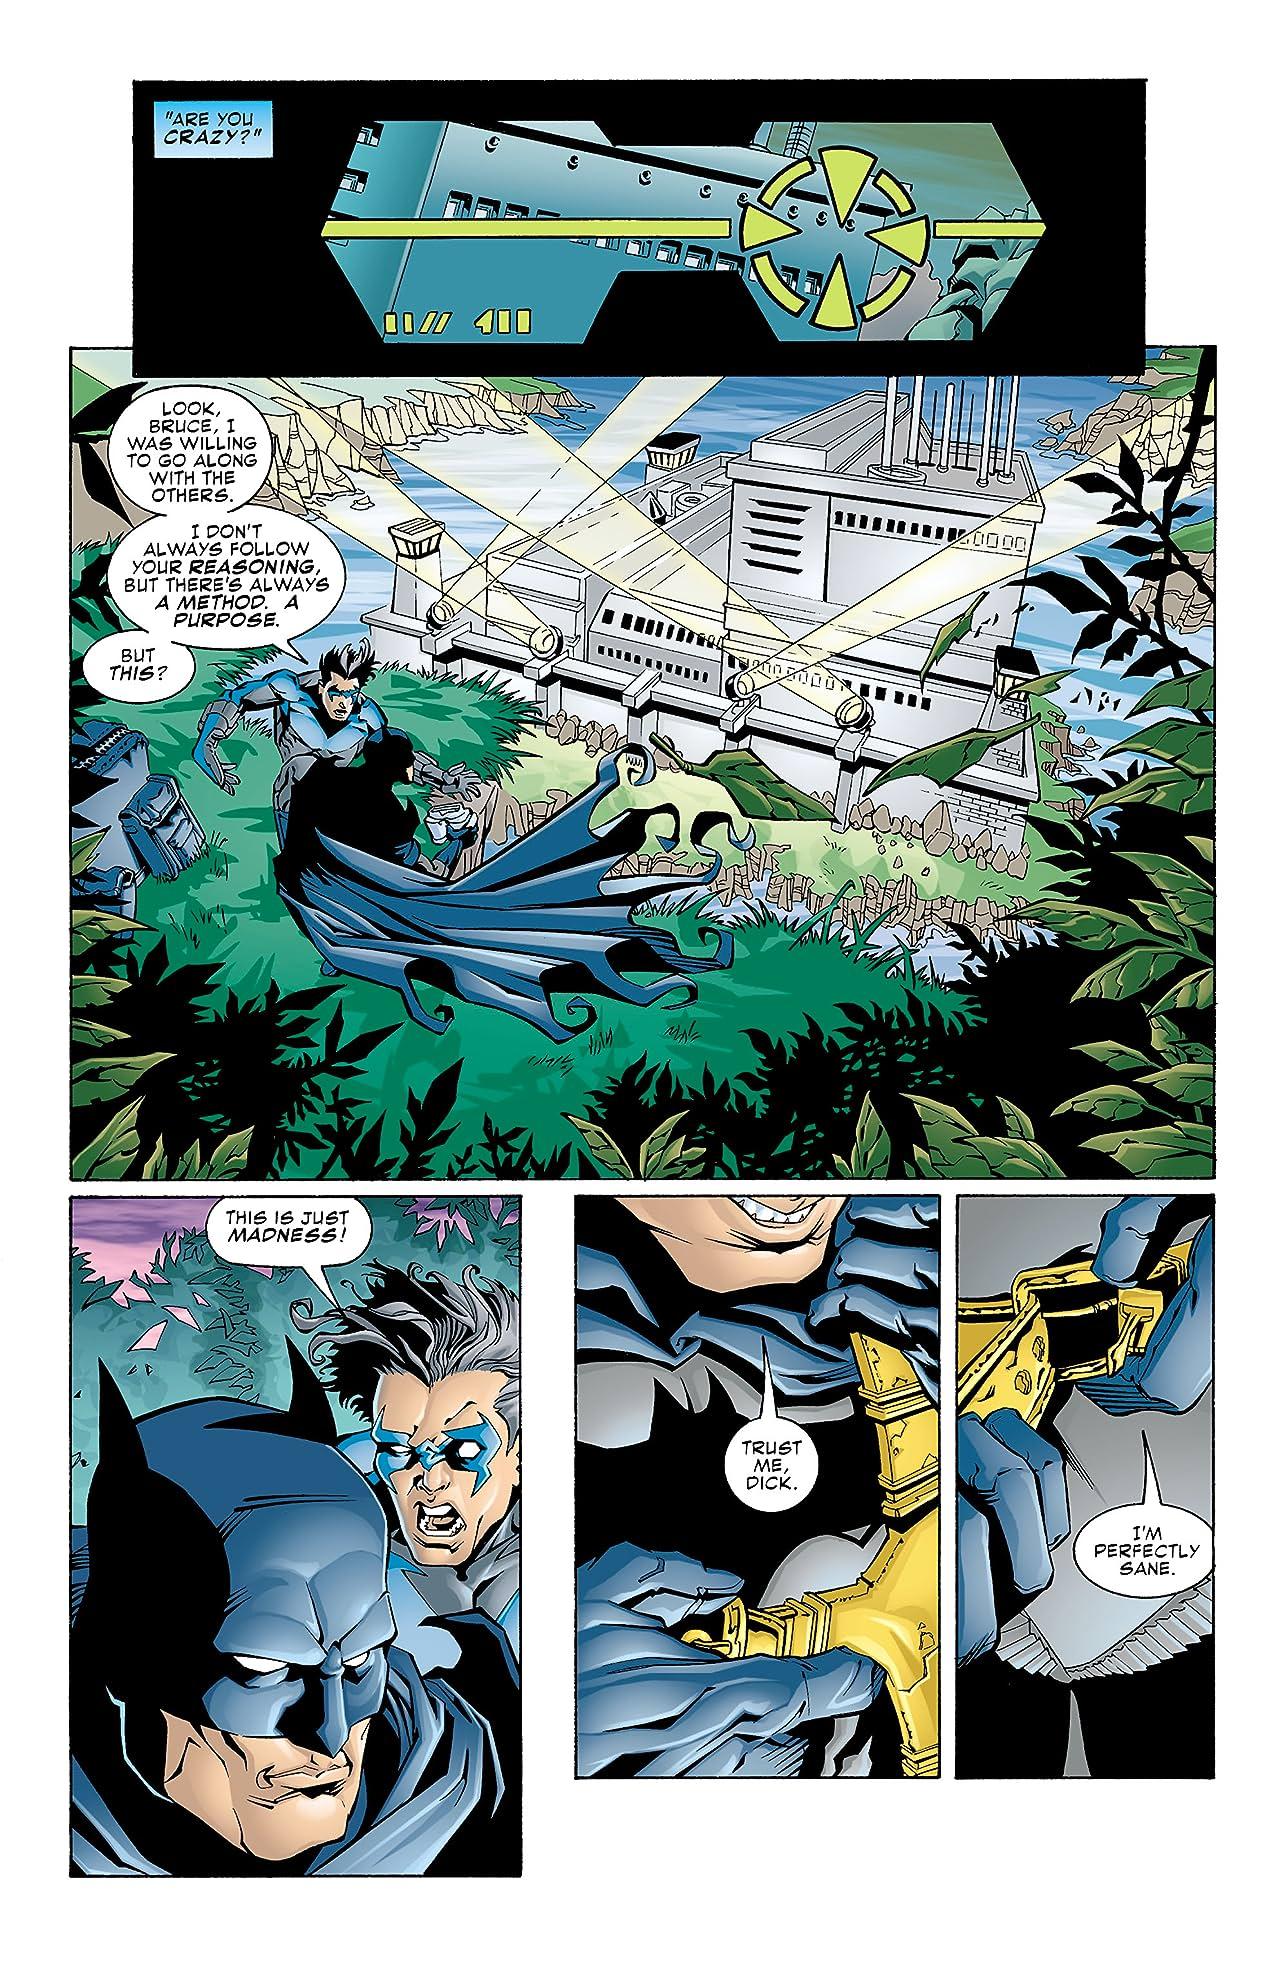 Justice Leagues (2001) #1: Justice League of Arkham